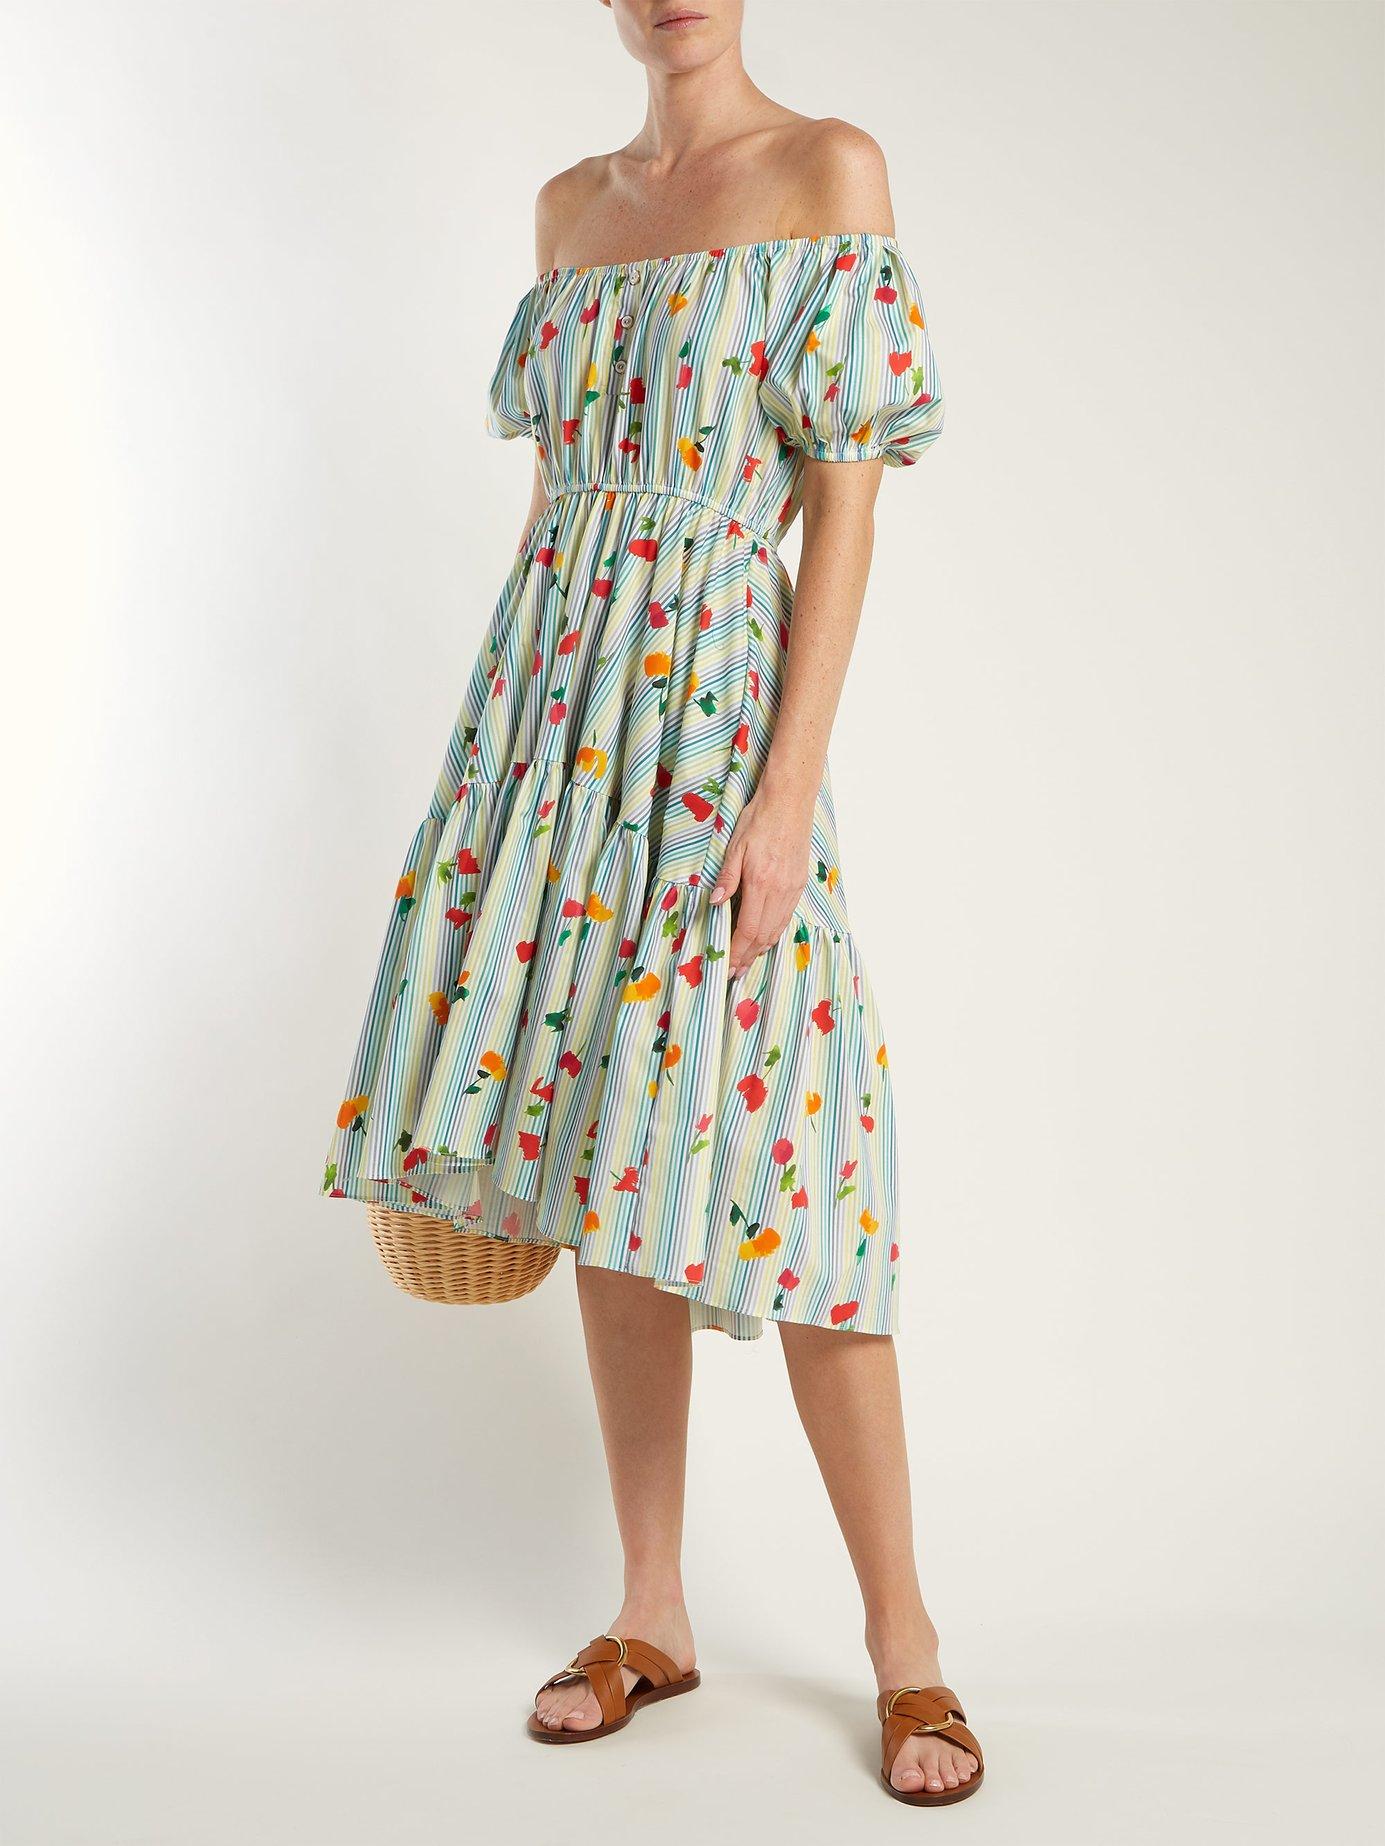 Striped floral-print cotton-blend dress by Caroline Constas